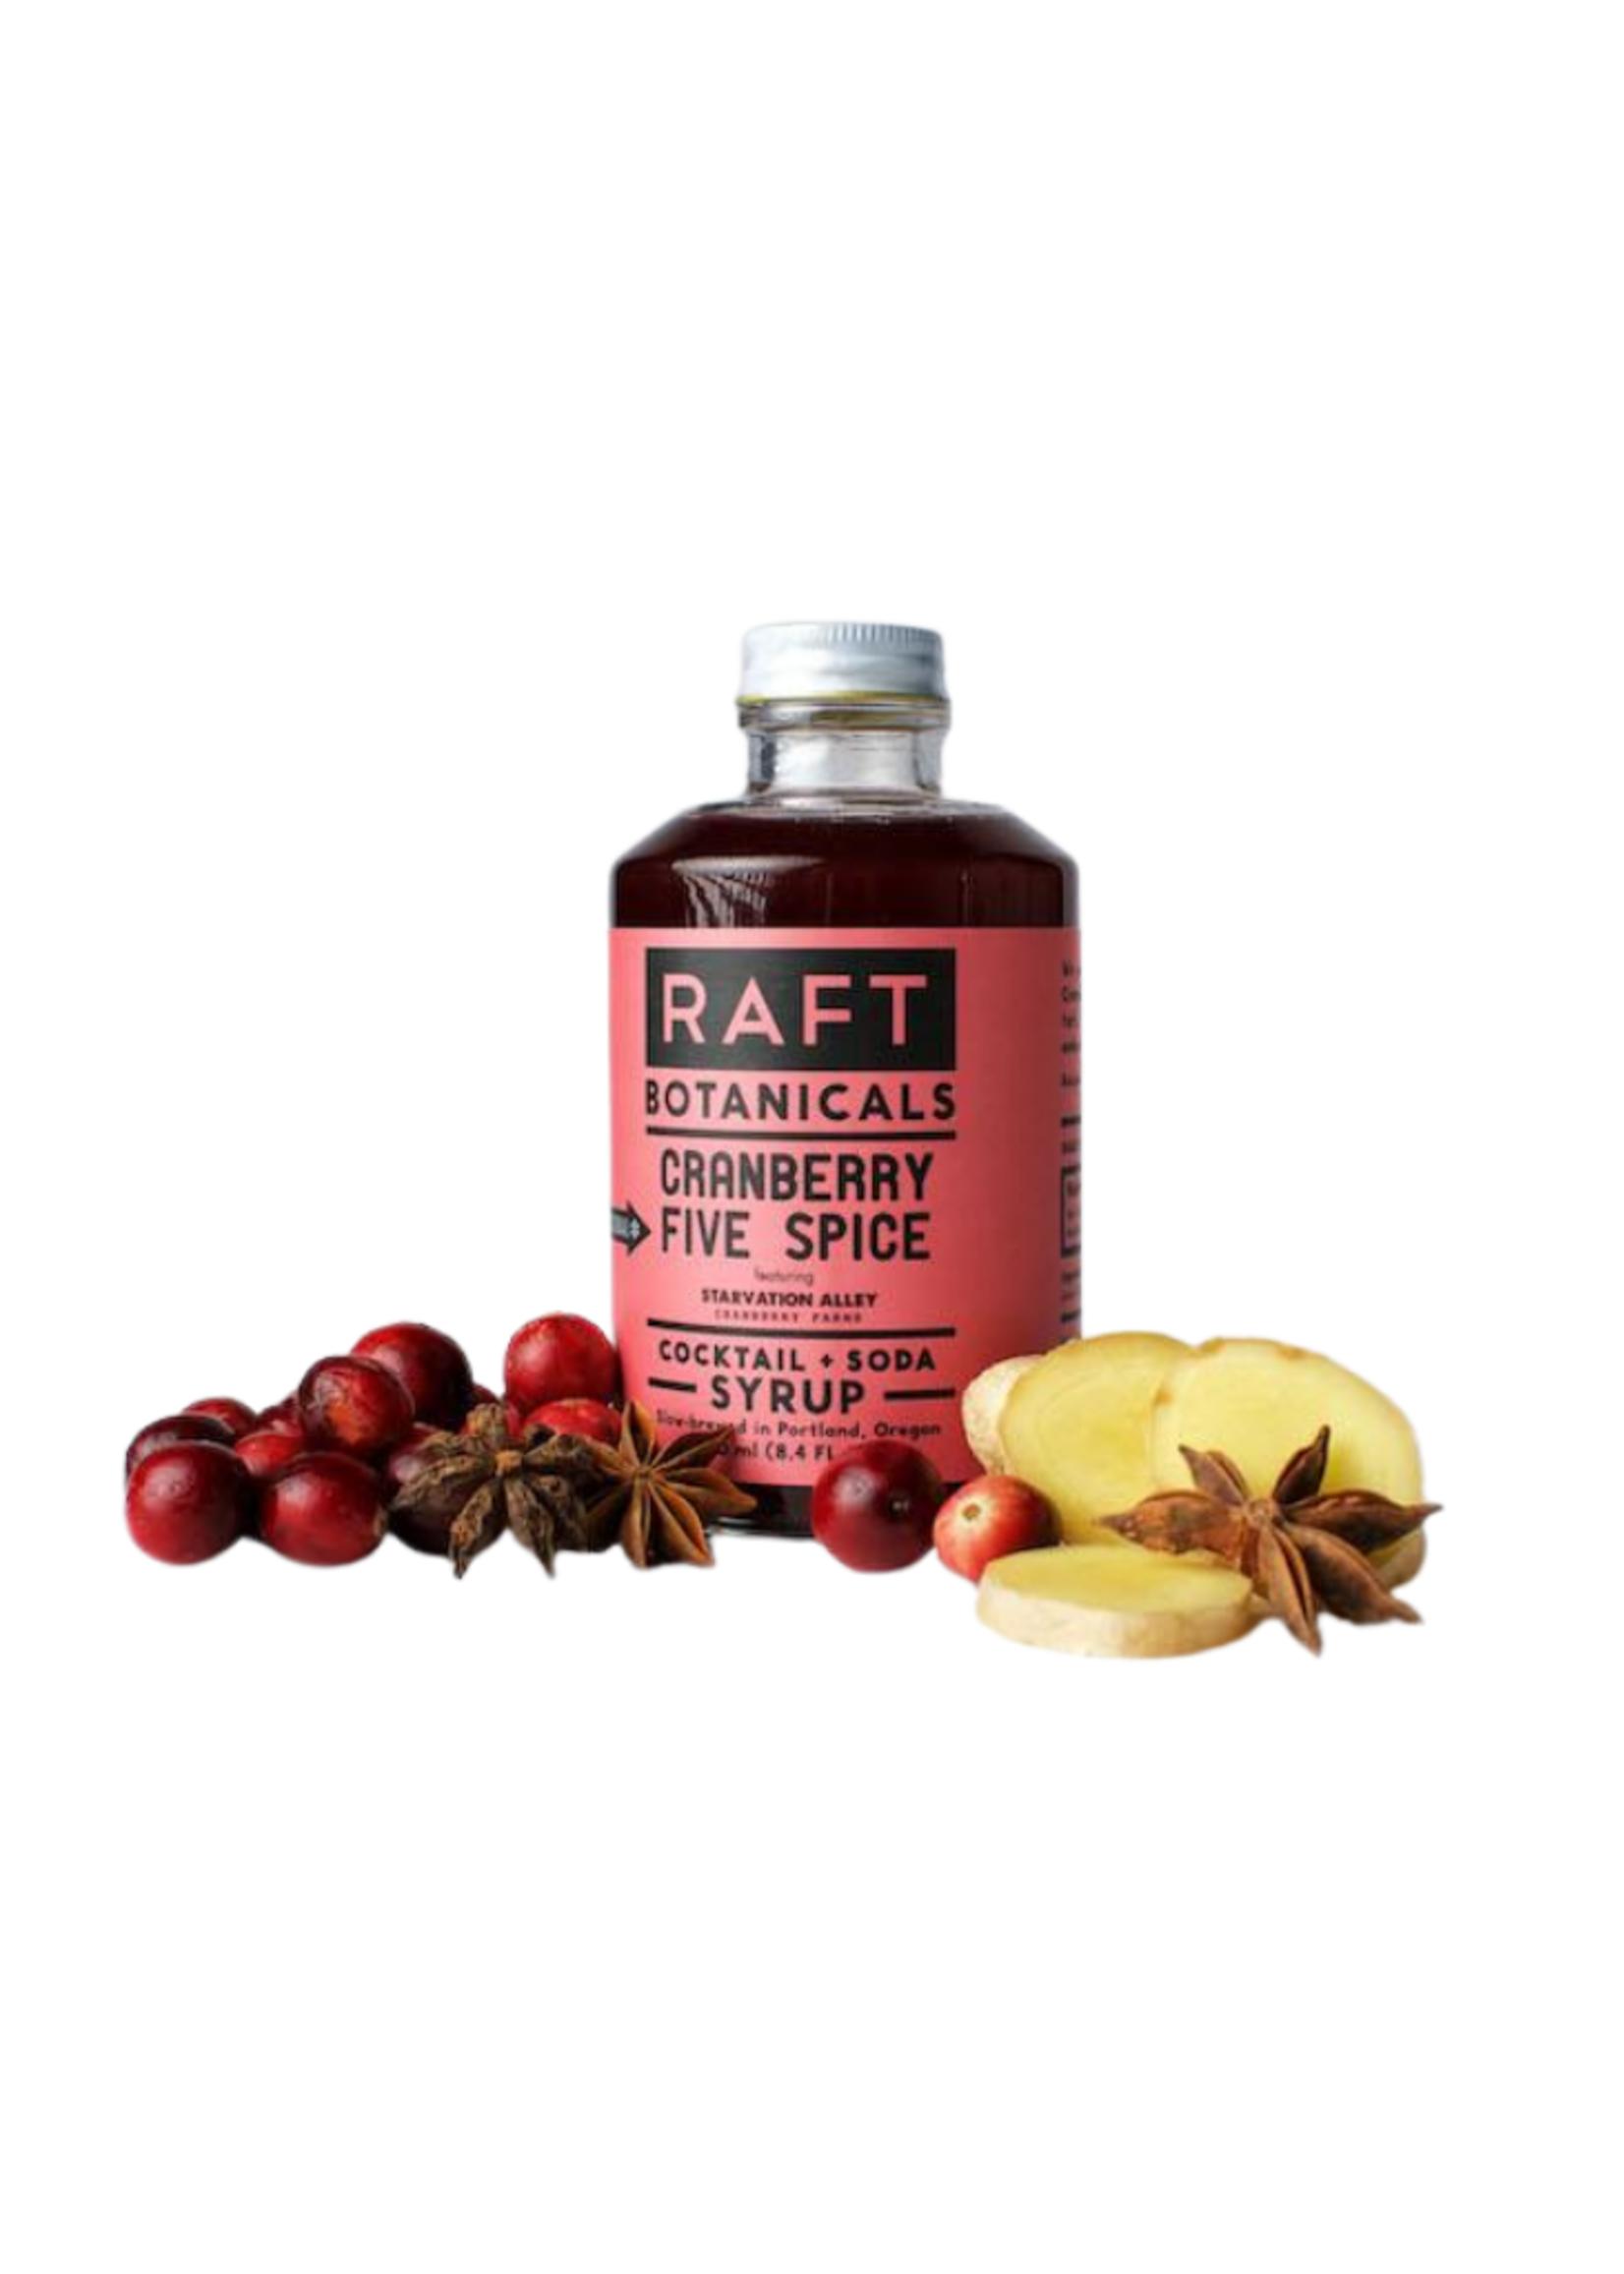 RAFT Cranberry 5 Spice Syrup